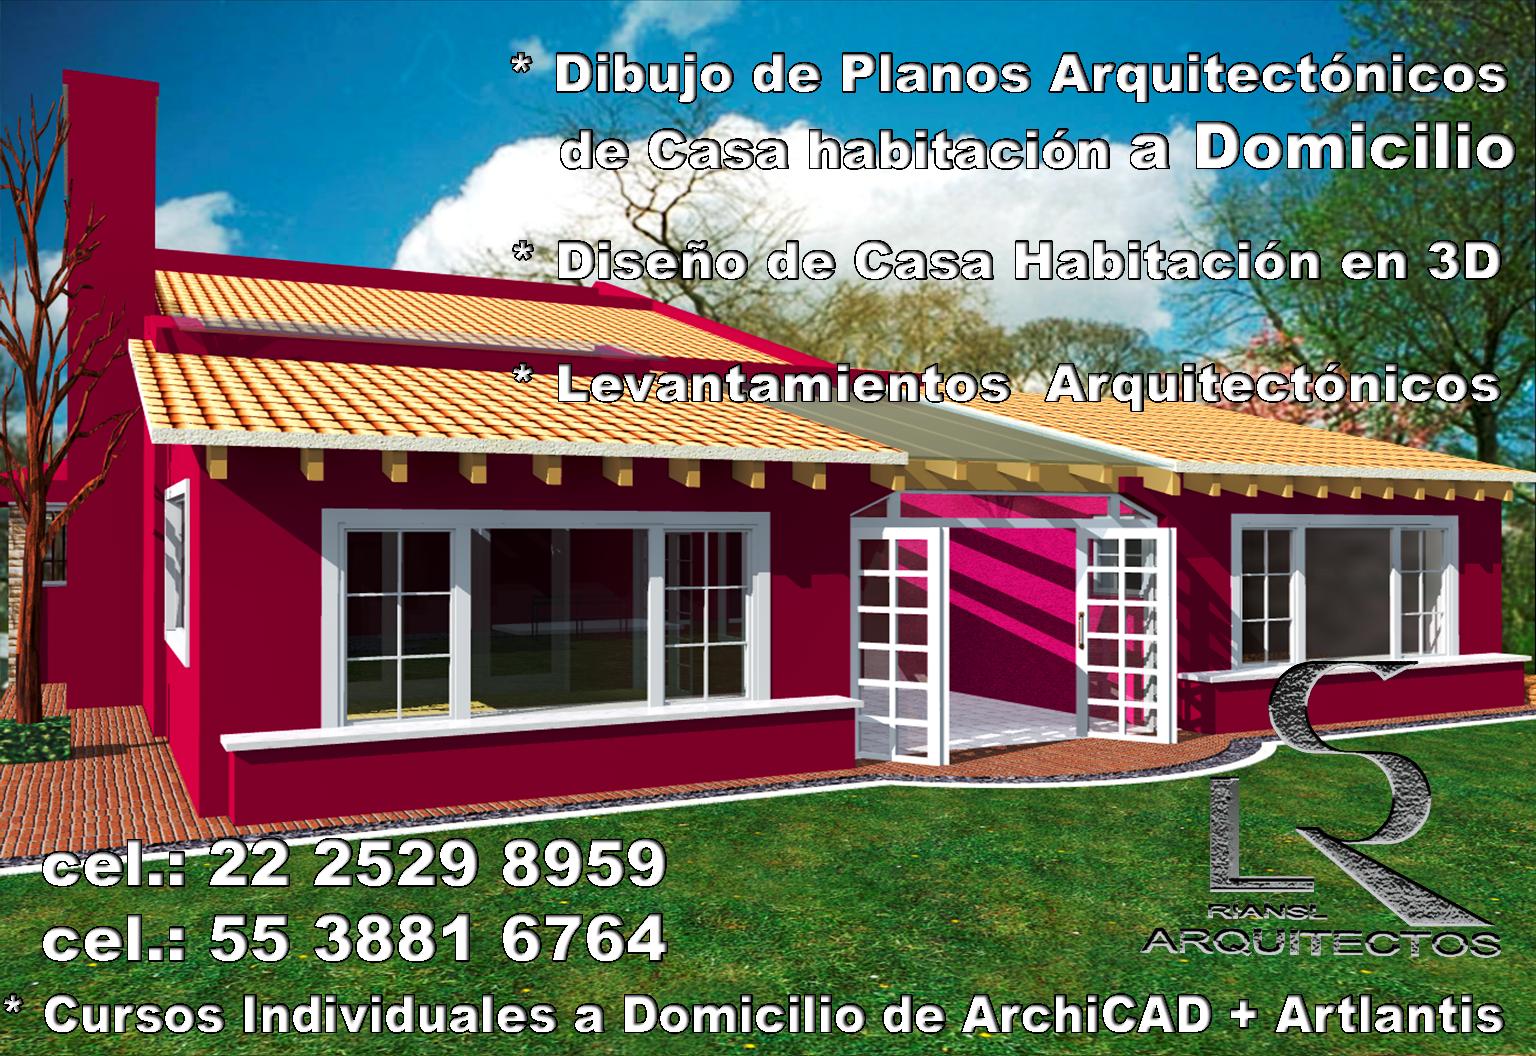 DISEÑO DE PLANOS ARQUITECTÓNICOS EN 3D SERVICIO DE DIBUJO DE PLANOS ARQUITECTÓNICOS A TODO MÉXICO